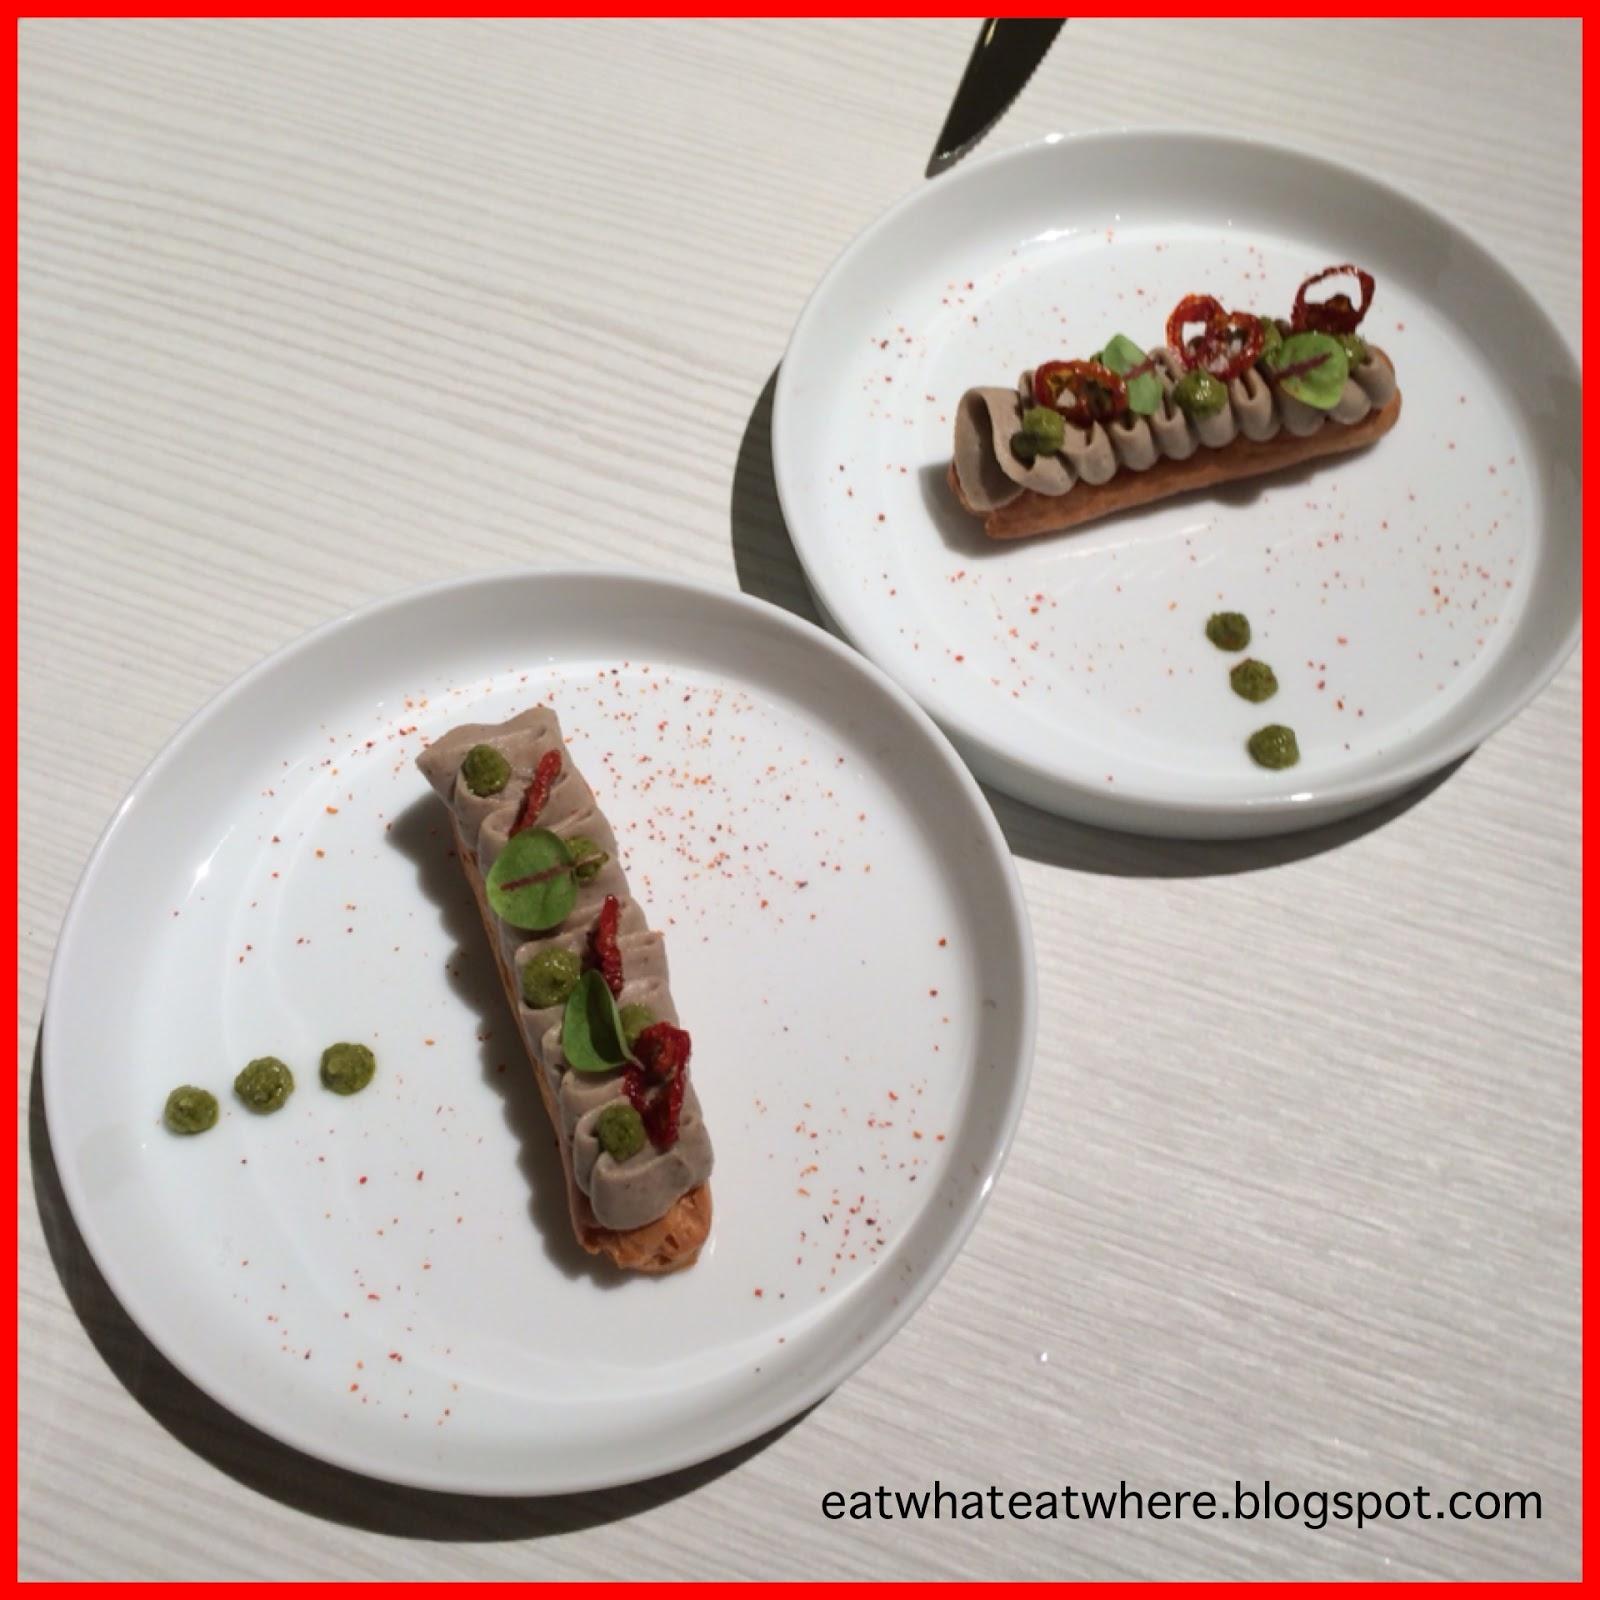 Eat what, Eat where?: Marco Creative Cuisine @ 1 Utama